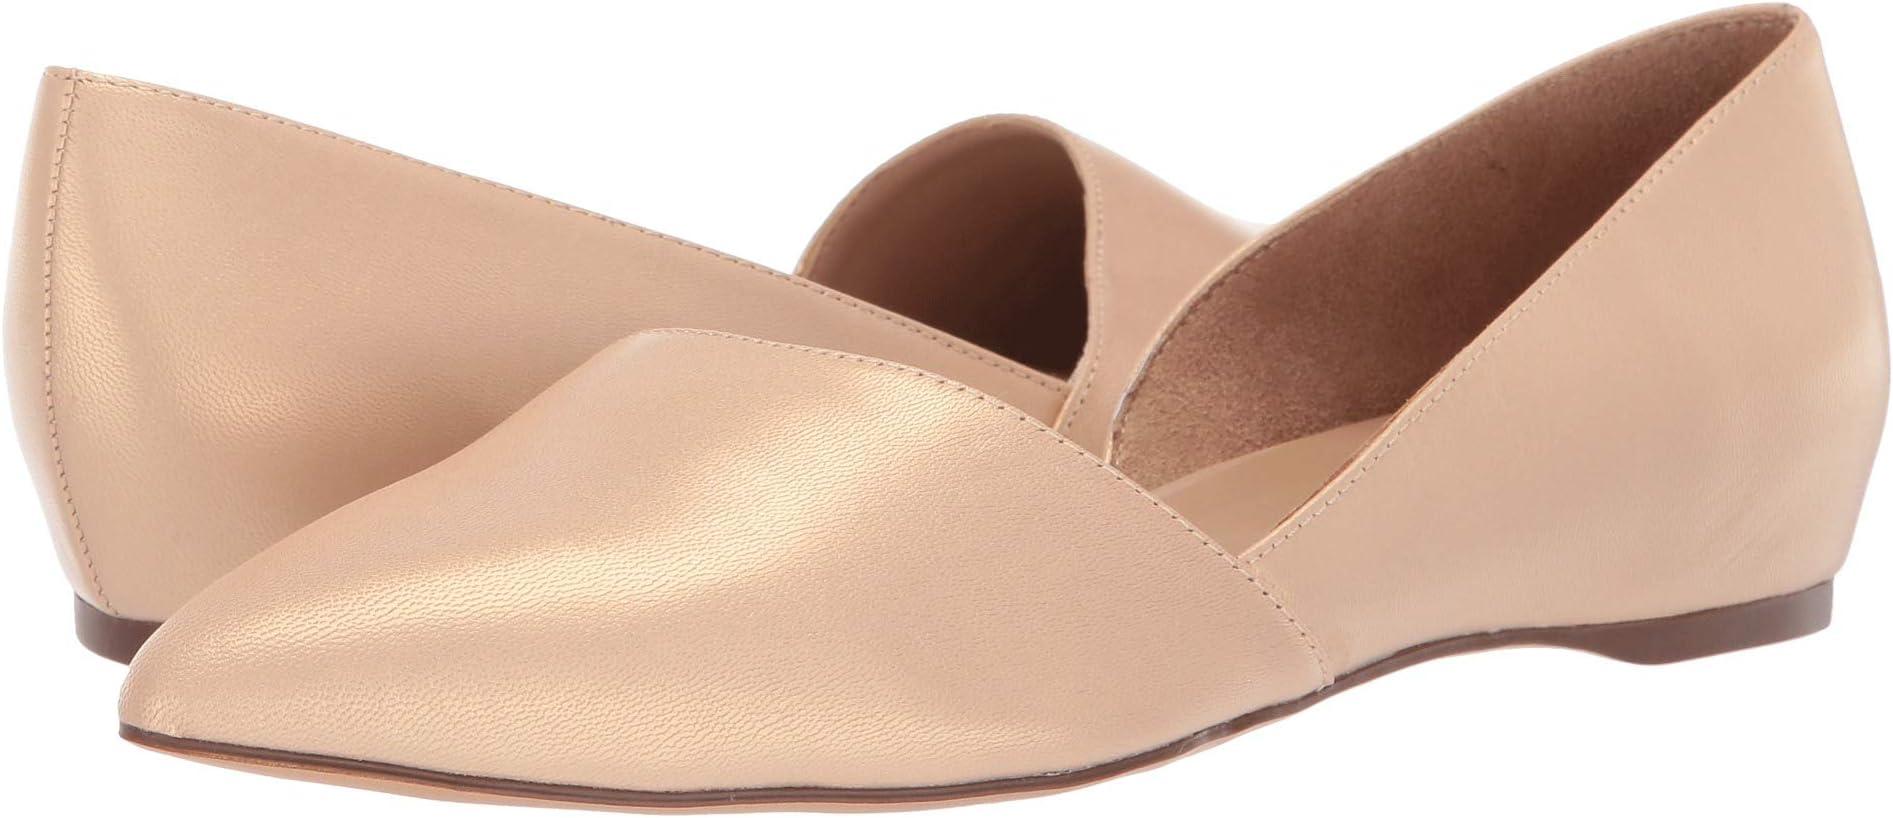 f28fe4b8a Naturalizer Sandals